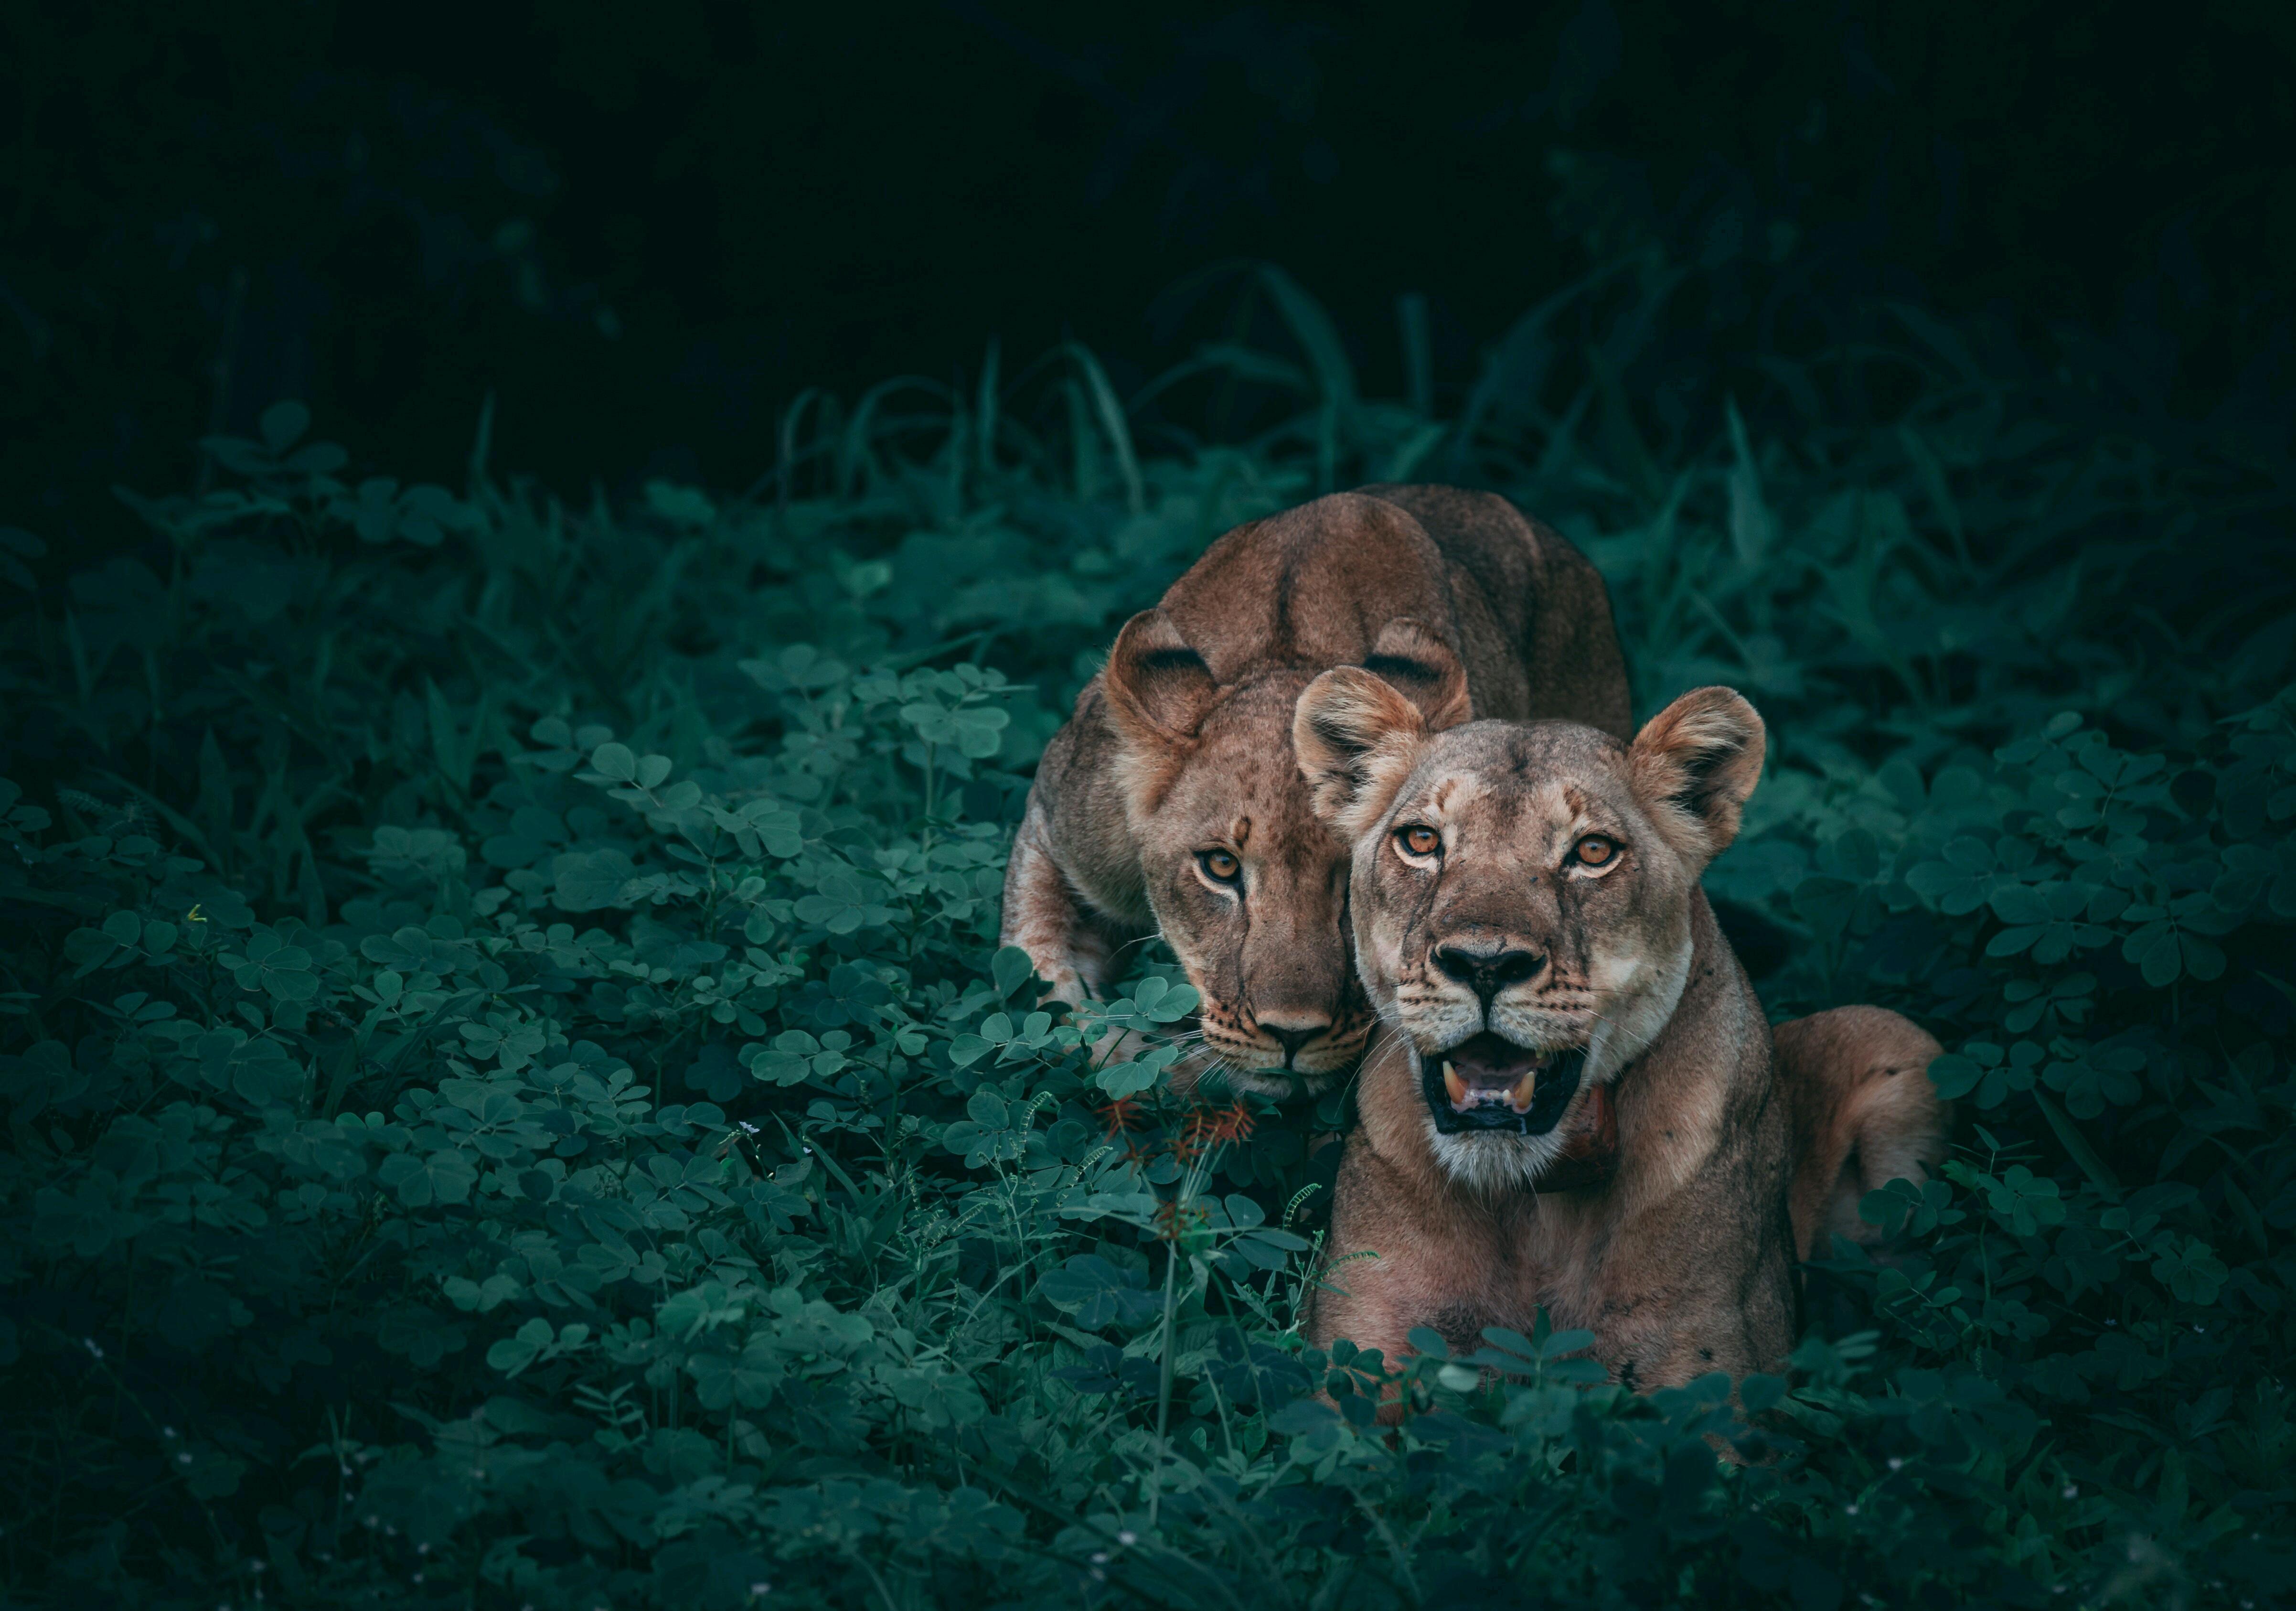 Lions wildlife 5k hd animals 4k wallpapers images - Lion 4k wallpaper for mobile ...